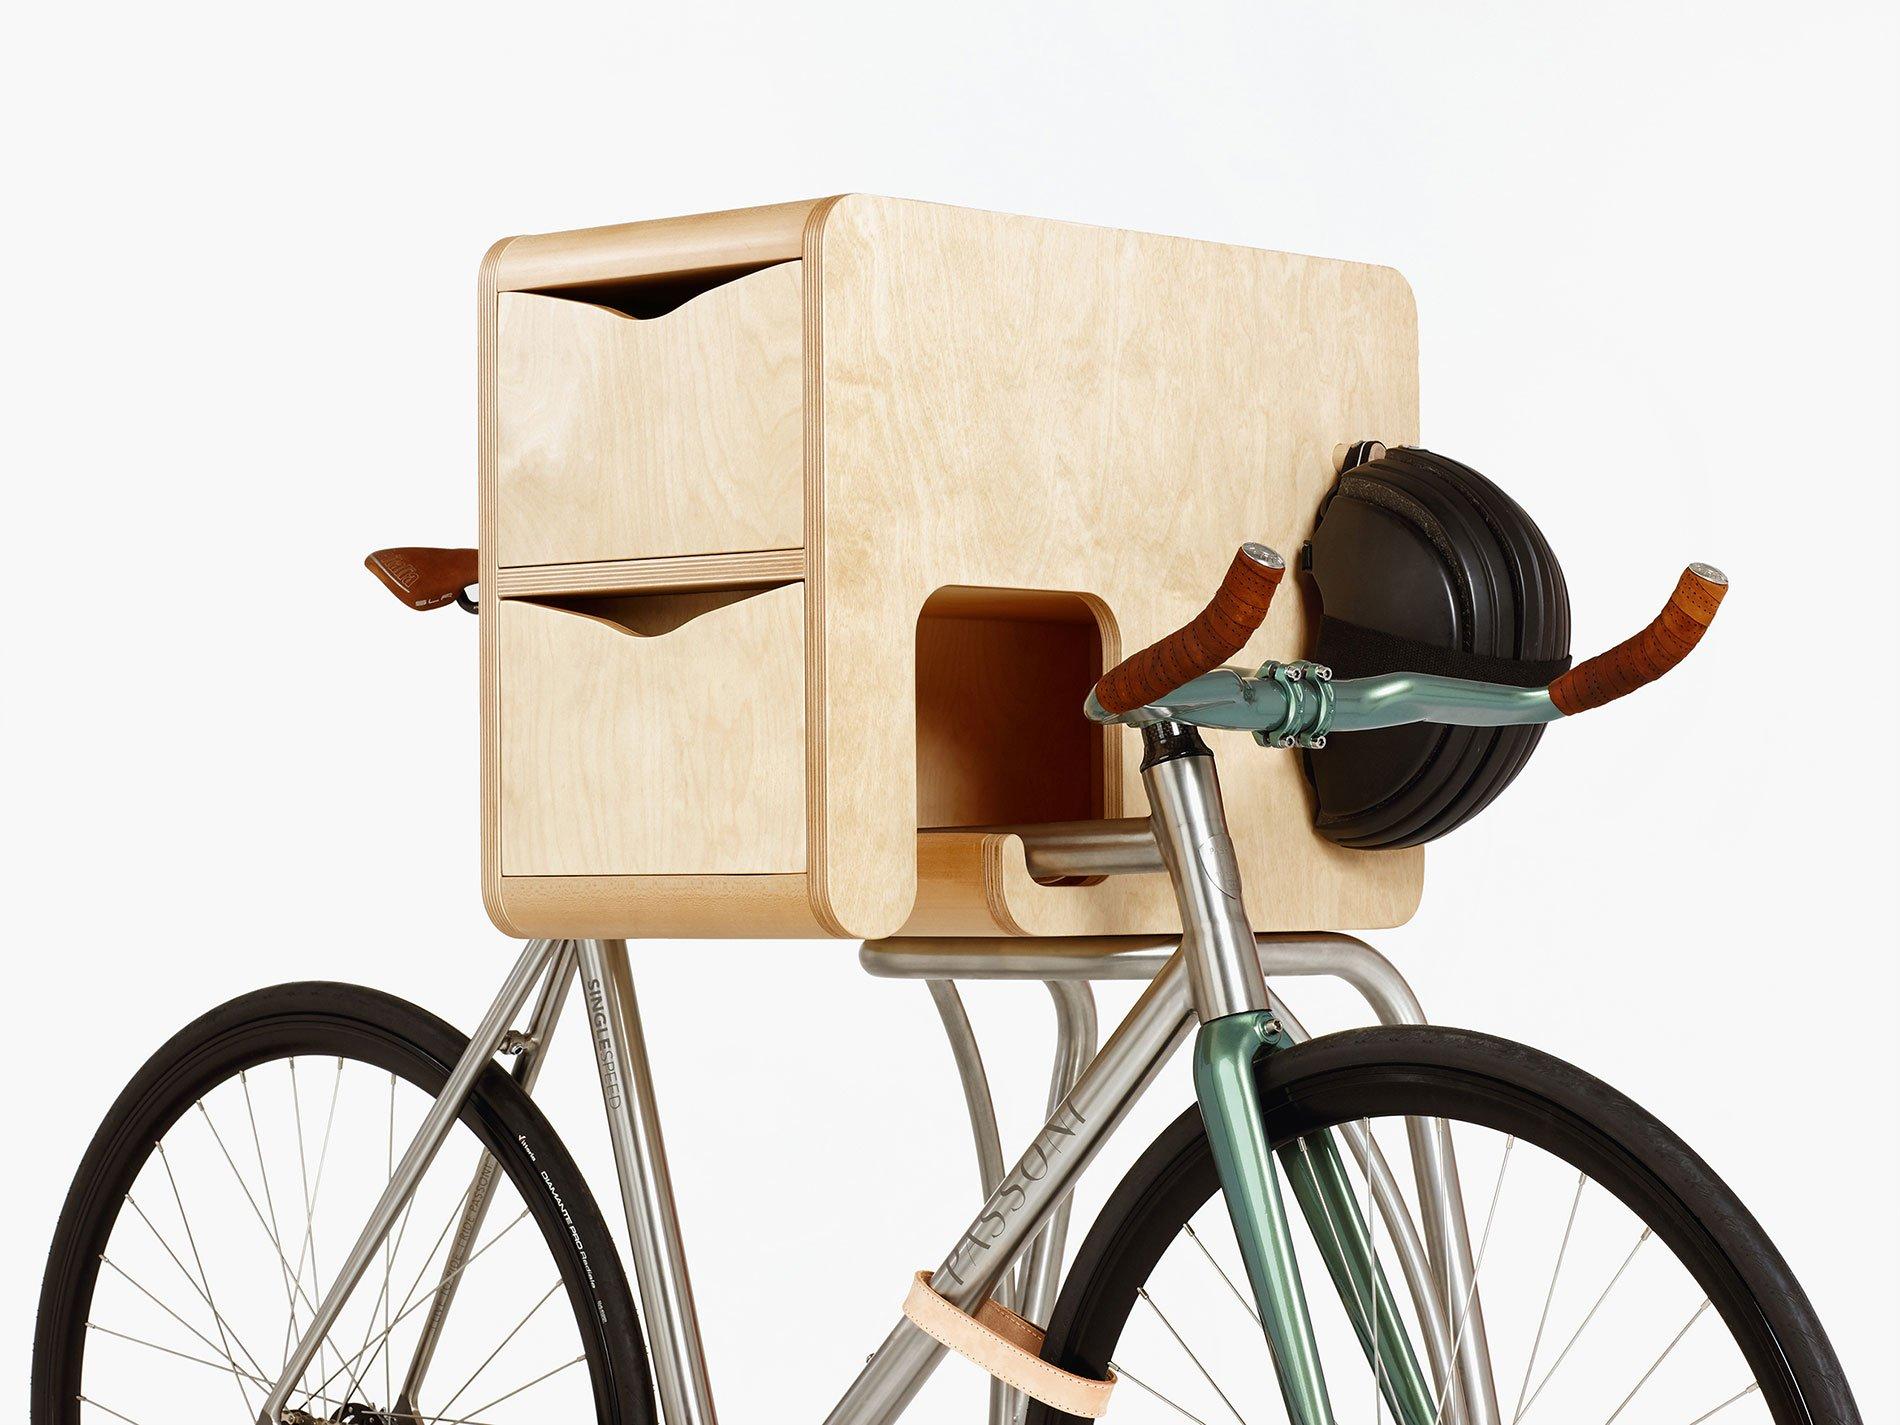 vadolibero-solves-bike-storage-for-the-urban-cyclist-gessato-5